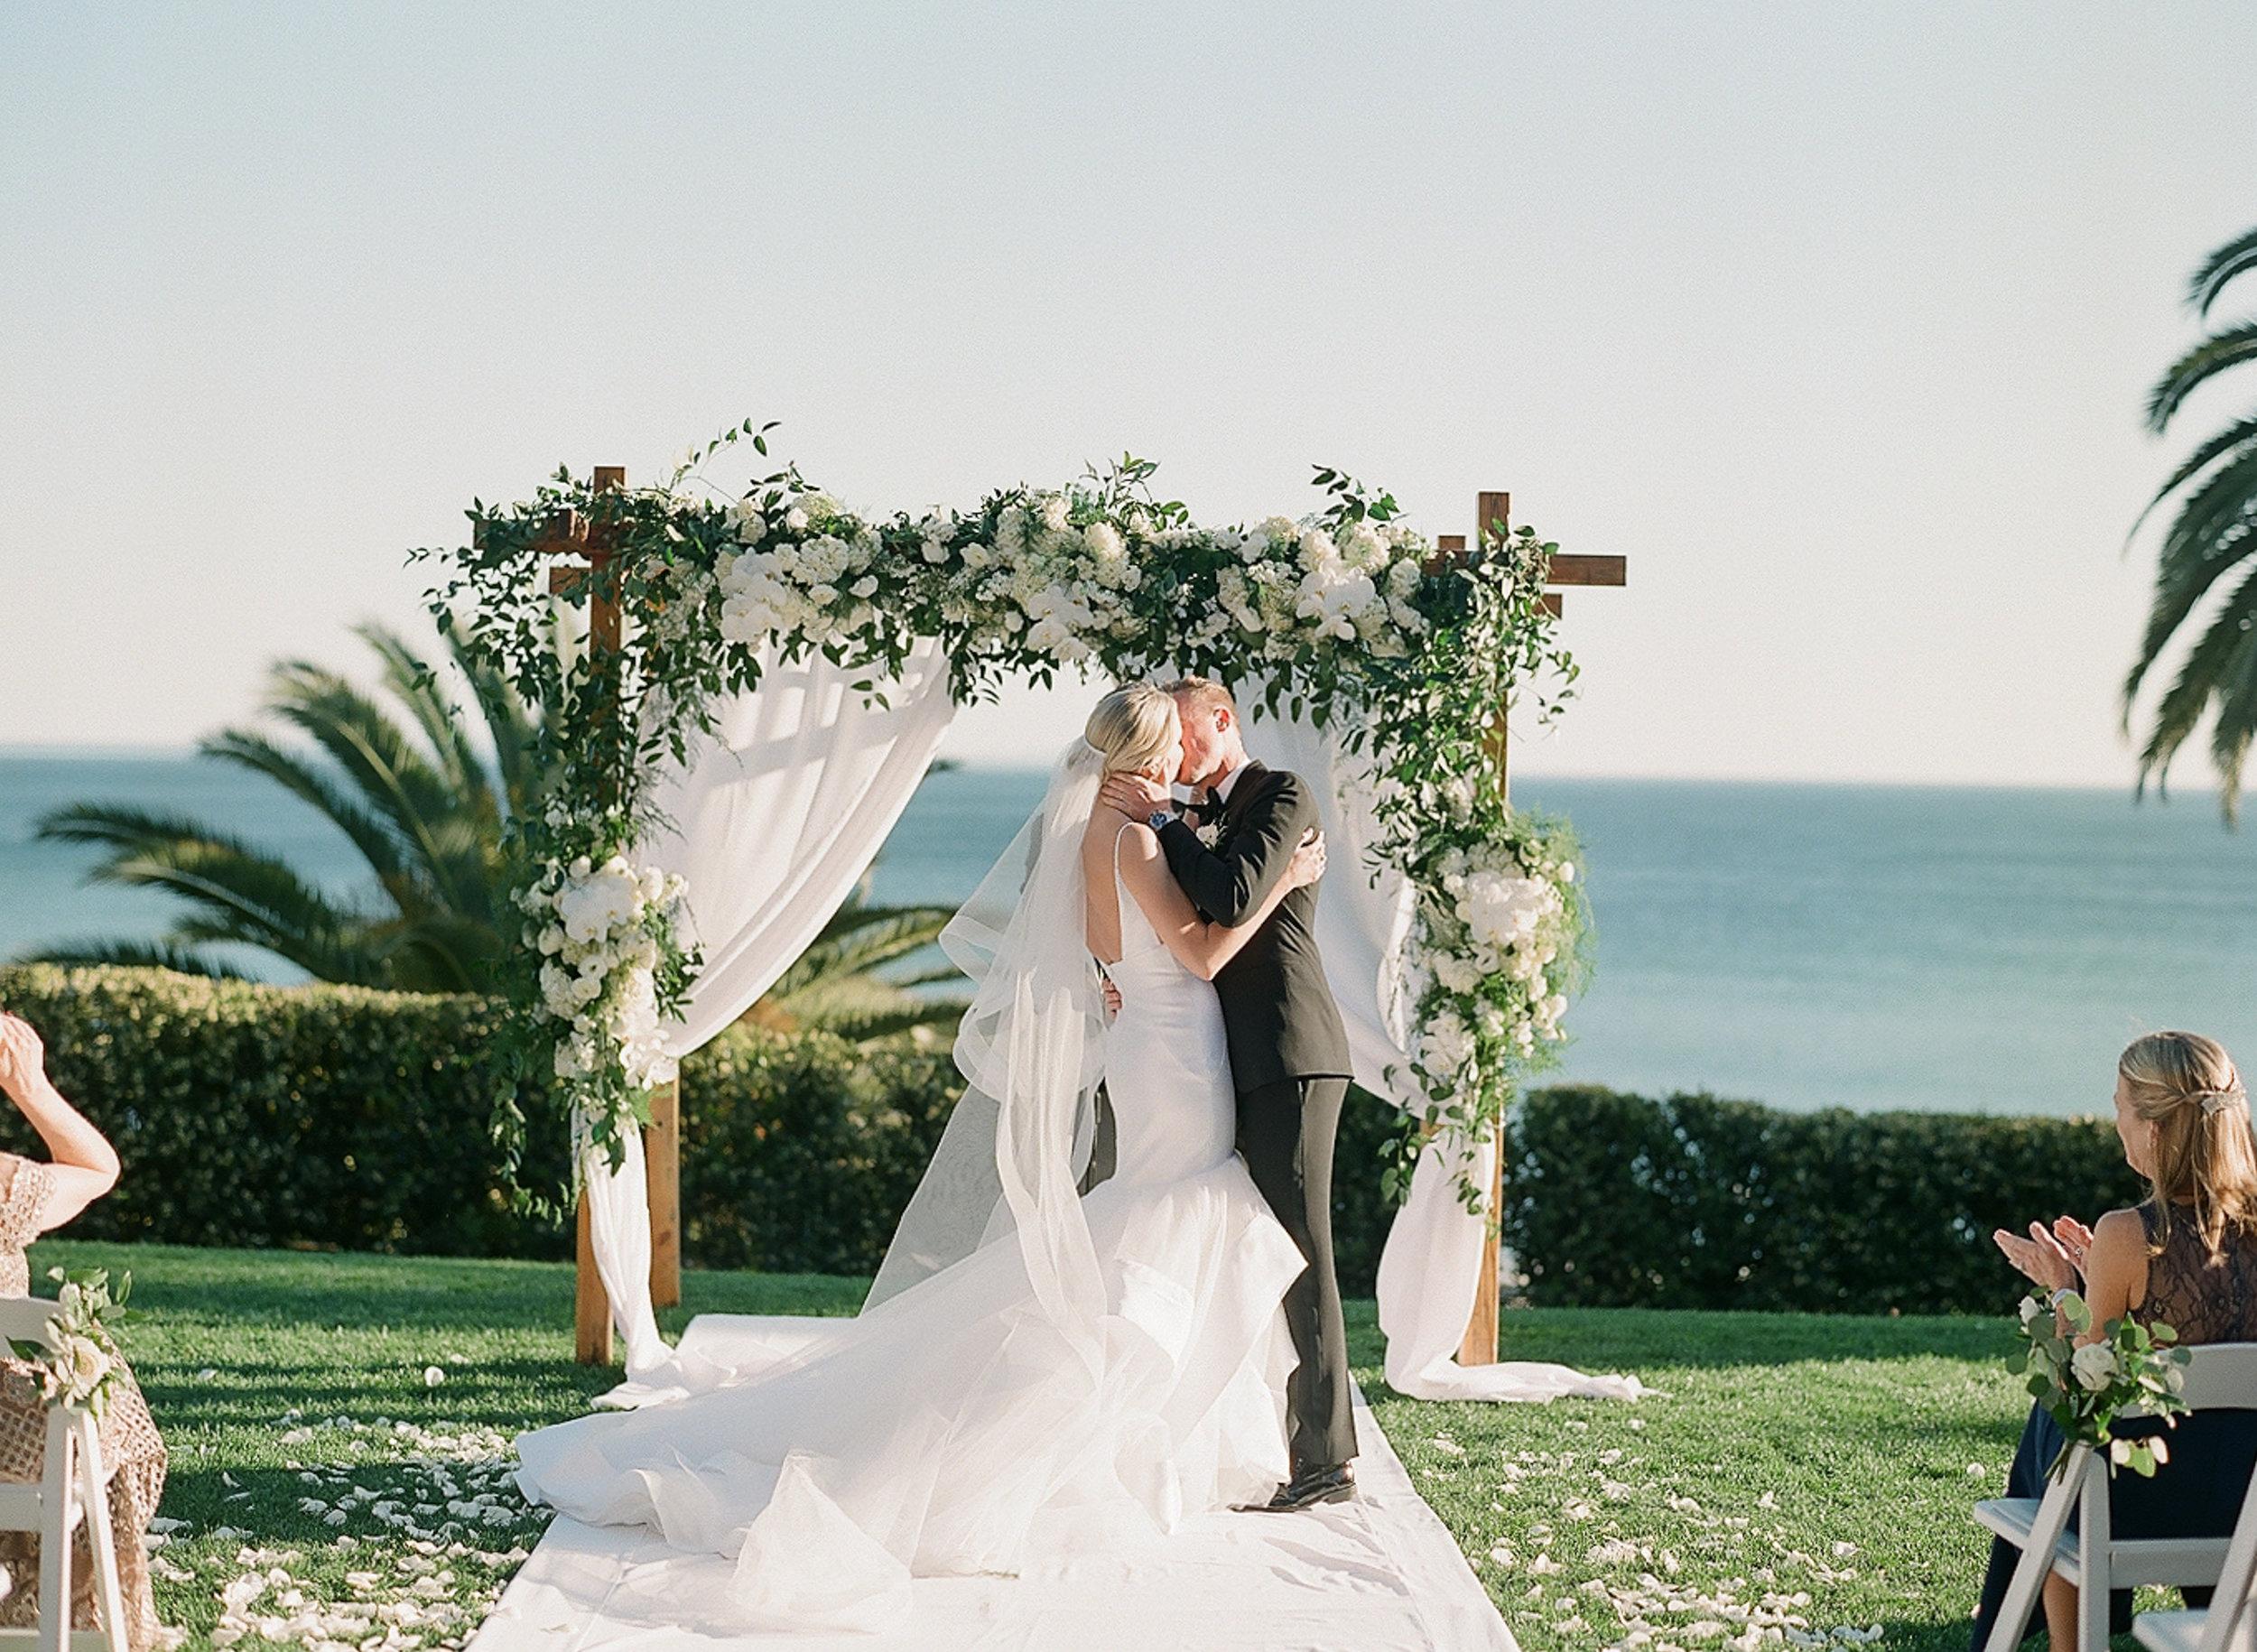 Bonphotage California Fine Art Wedding Photography - Bel Air Bay Club